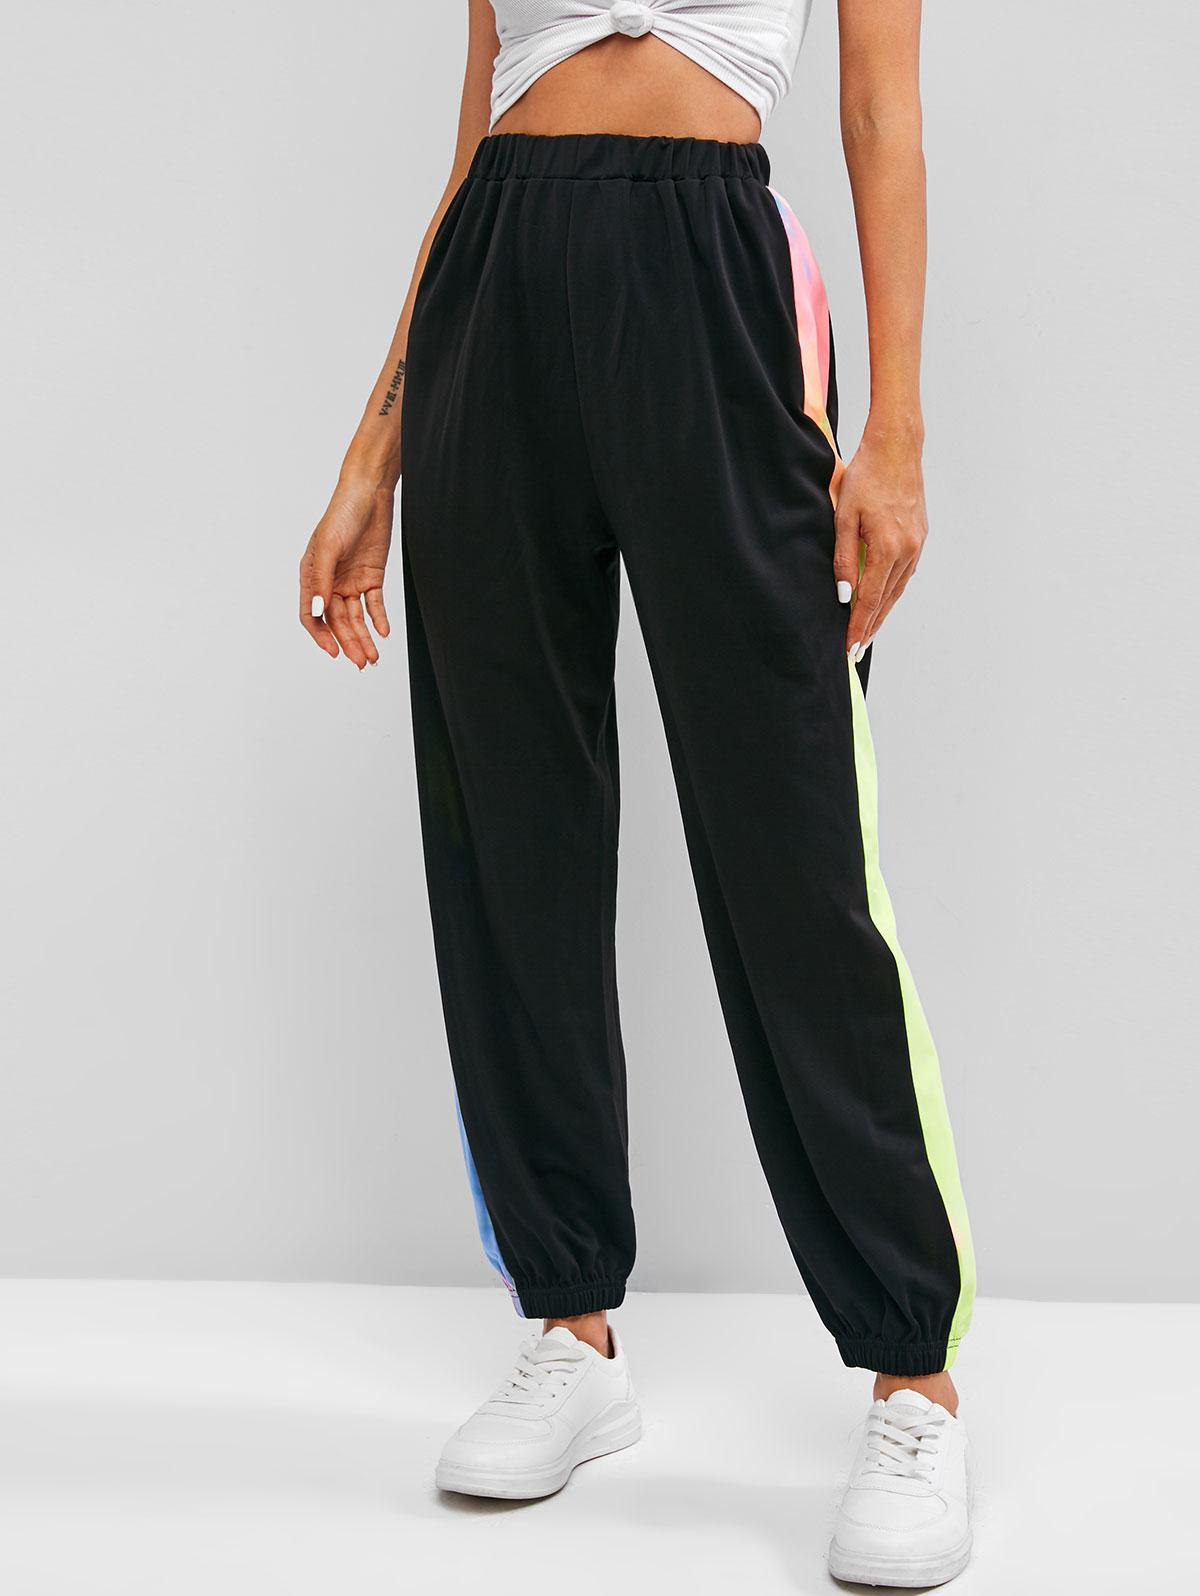 Tie Dye Side Pull On Jogger Pants